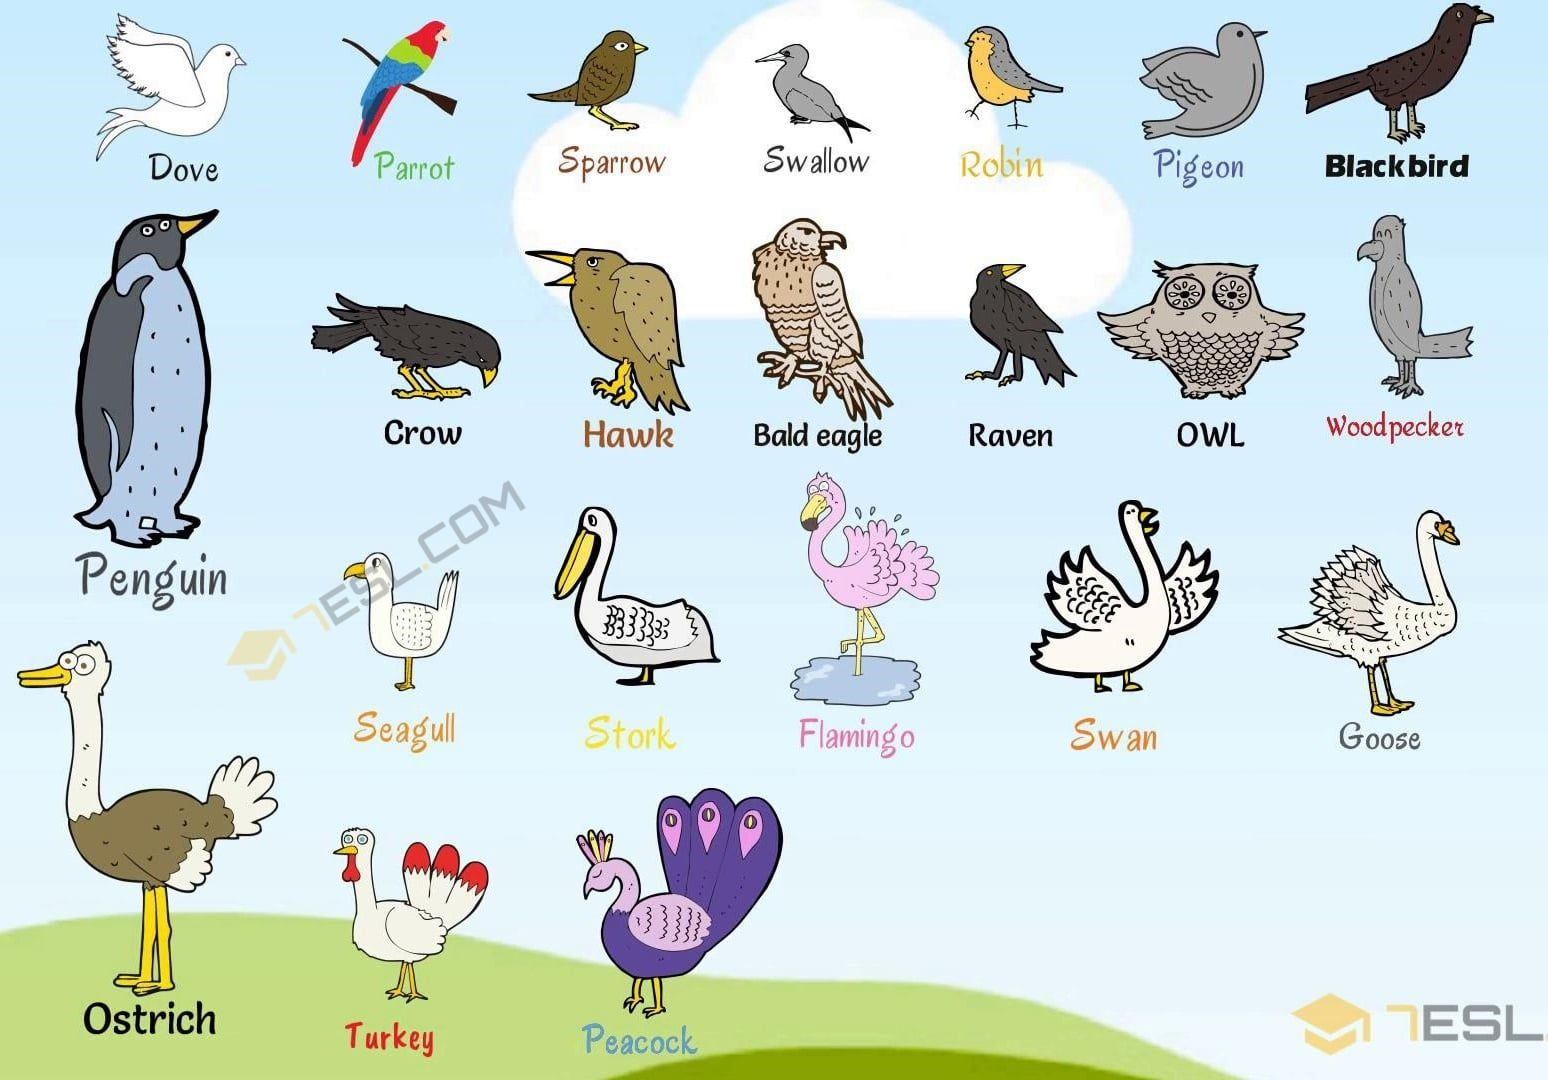 Bird Names List Of Birds With Useful Birds Images Birds